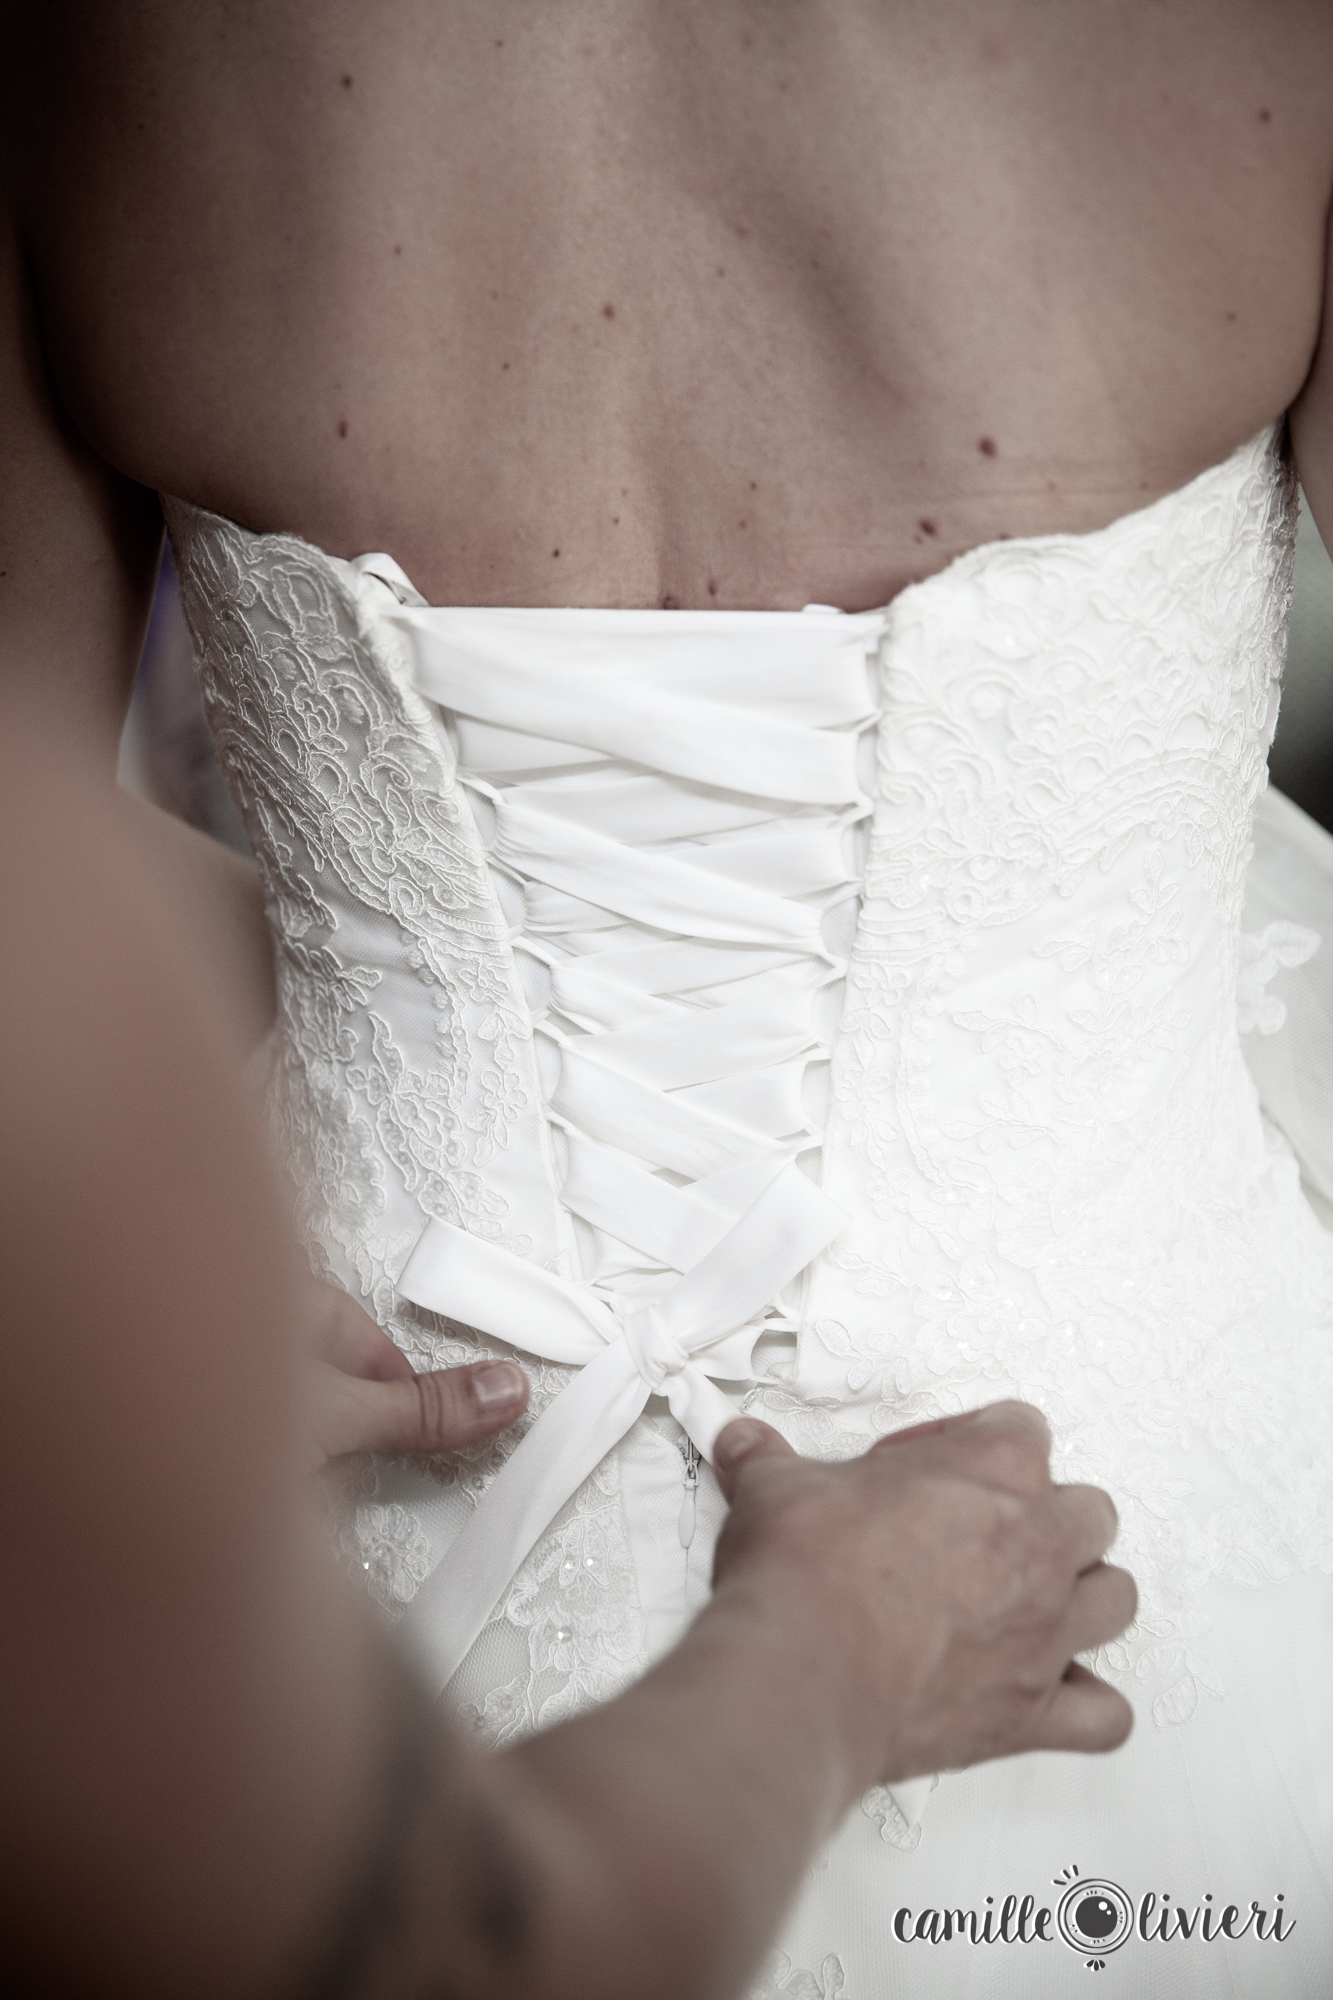 photographe_grenoble_mariage-camille-olivieri-91